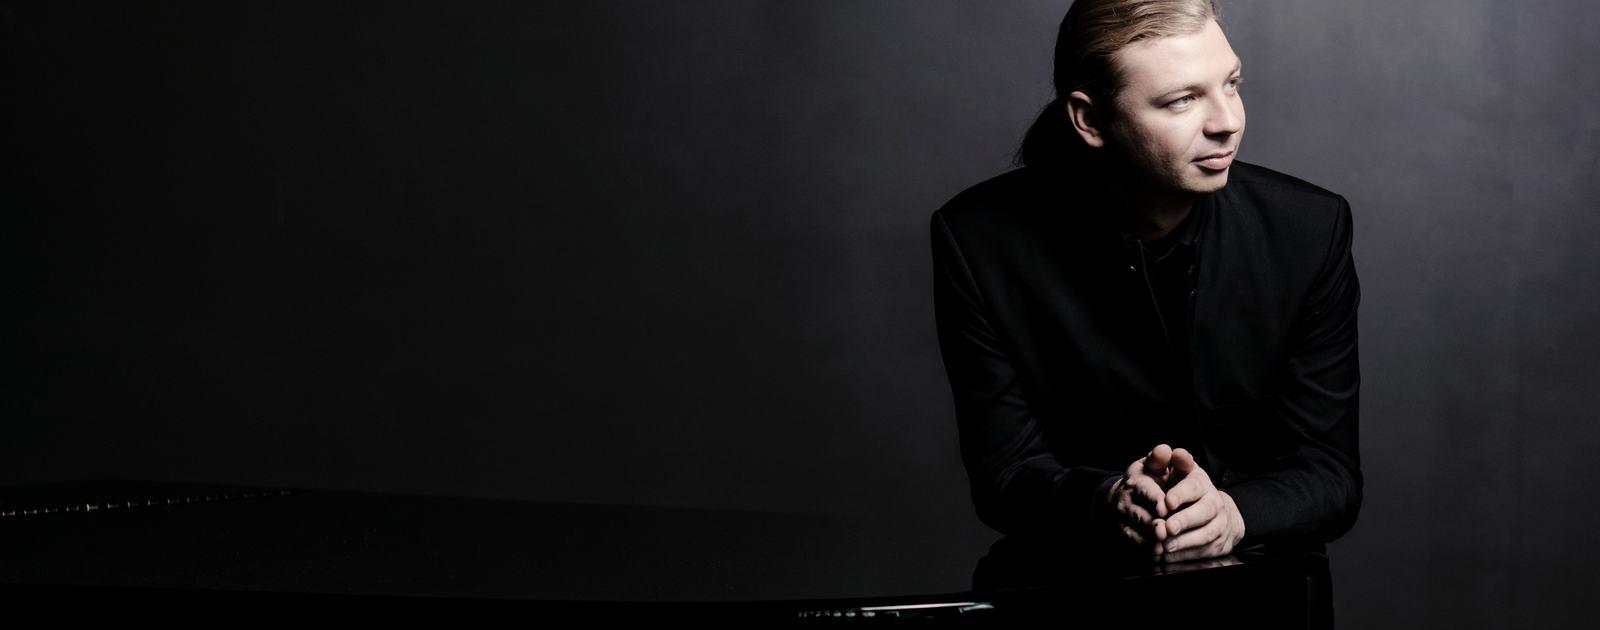 Denis Kozukhin 2016.Pianist.Photo: Marco Borggreve